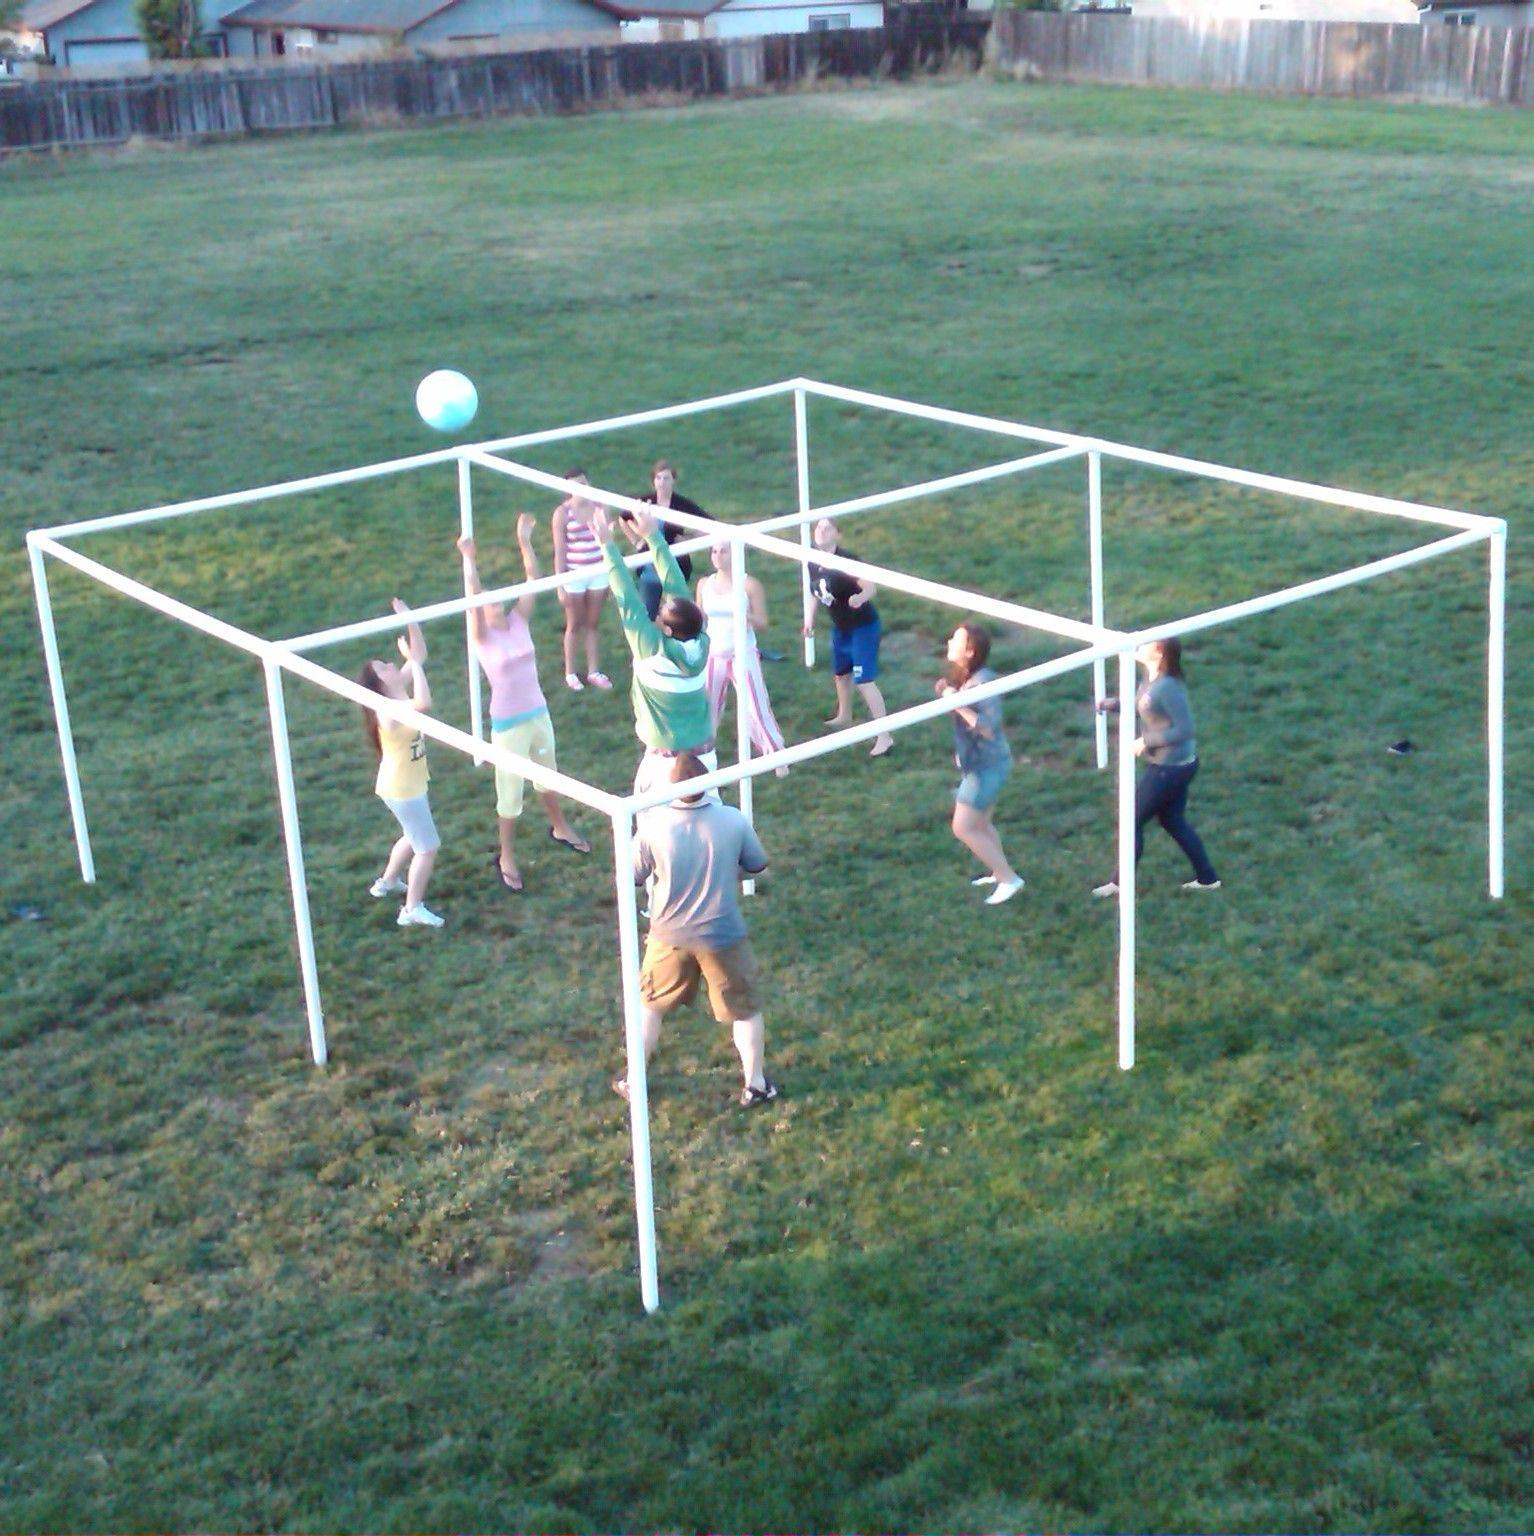 Buckets O Fun Com Volley Square Team Building Group Games Youth Group Games Youth Games Group Games